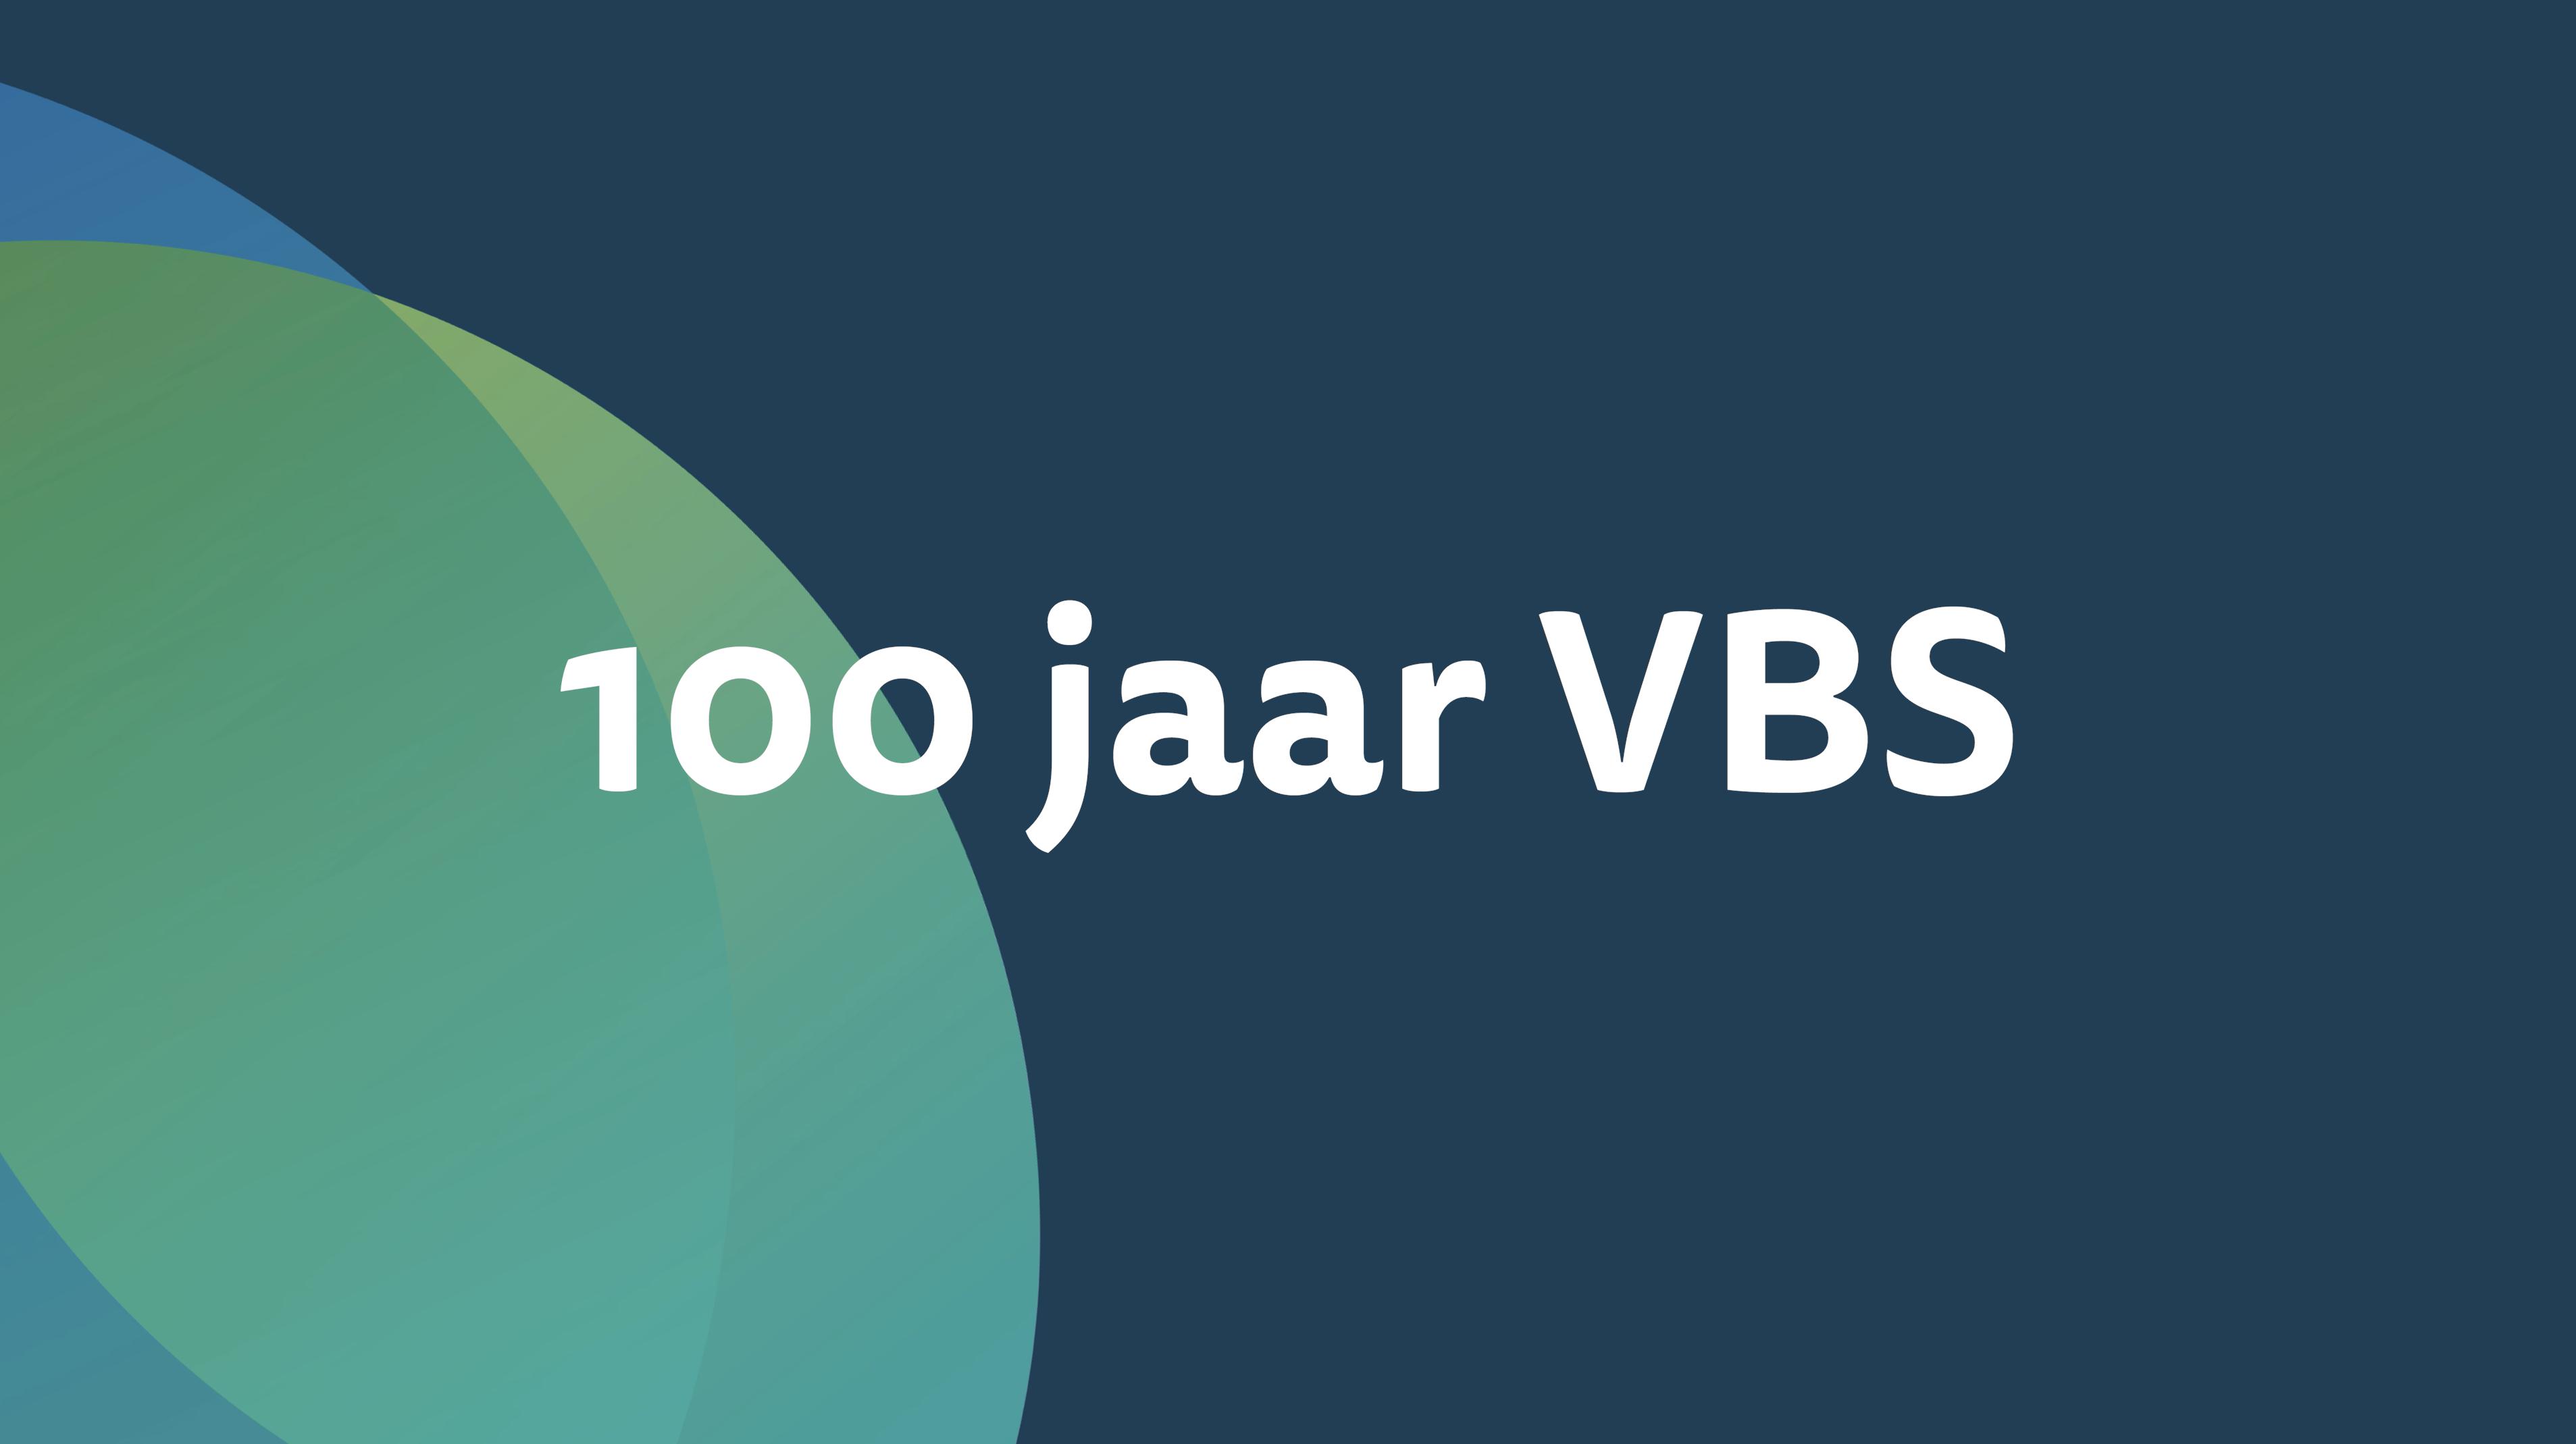 VBS Roadshow 2021